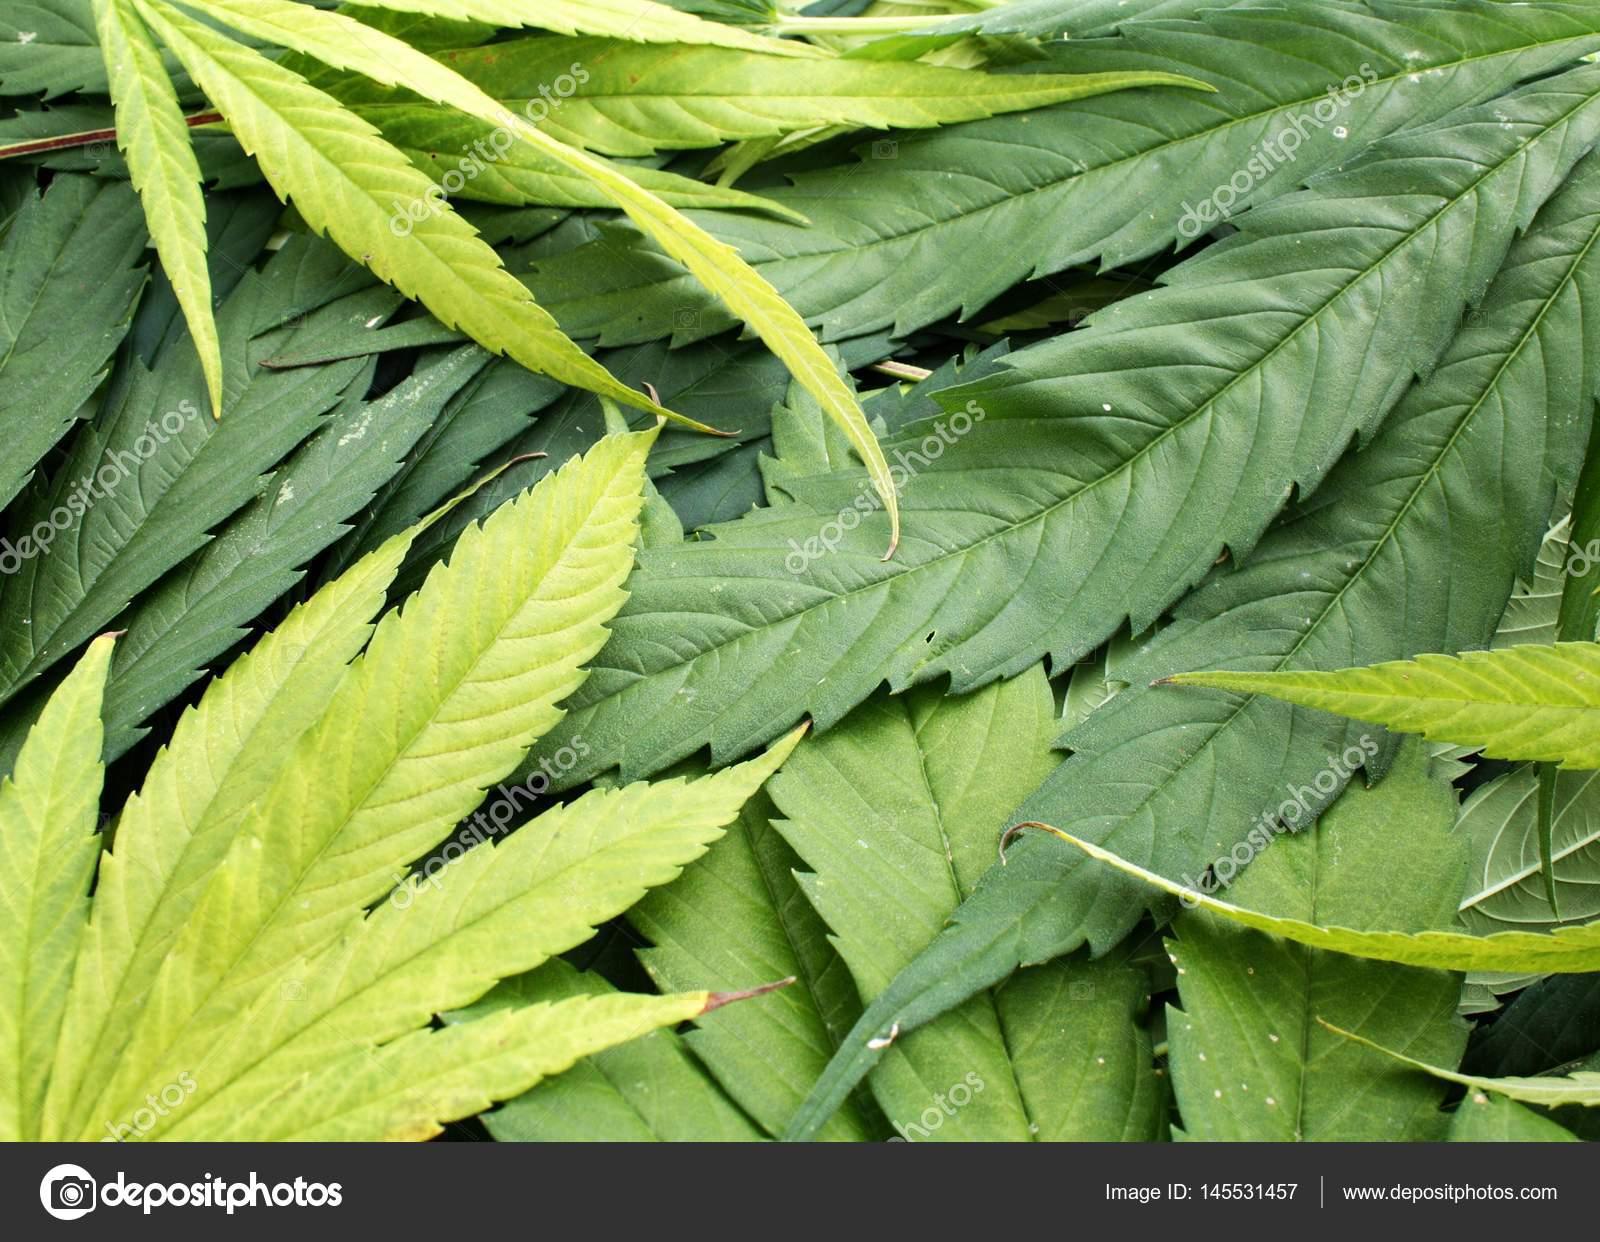 Yellow And Green Marijuana Leaves Pile Natural Photo Stock Photo